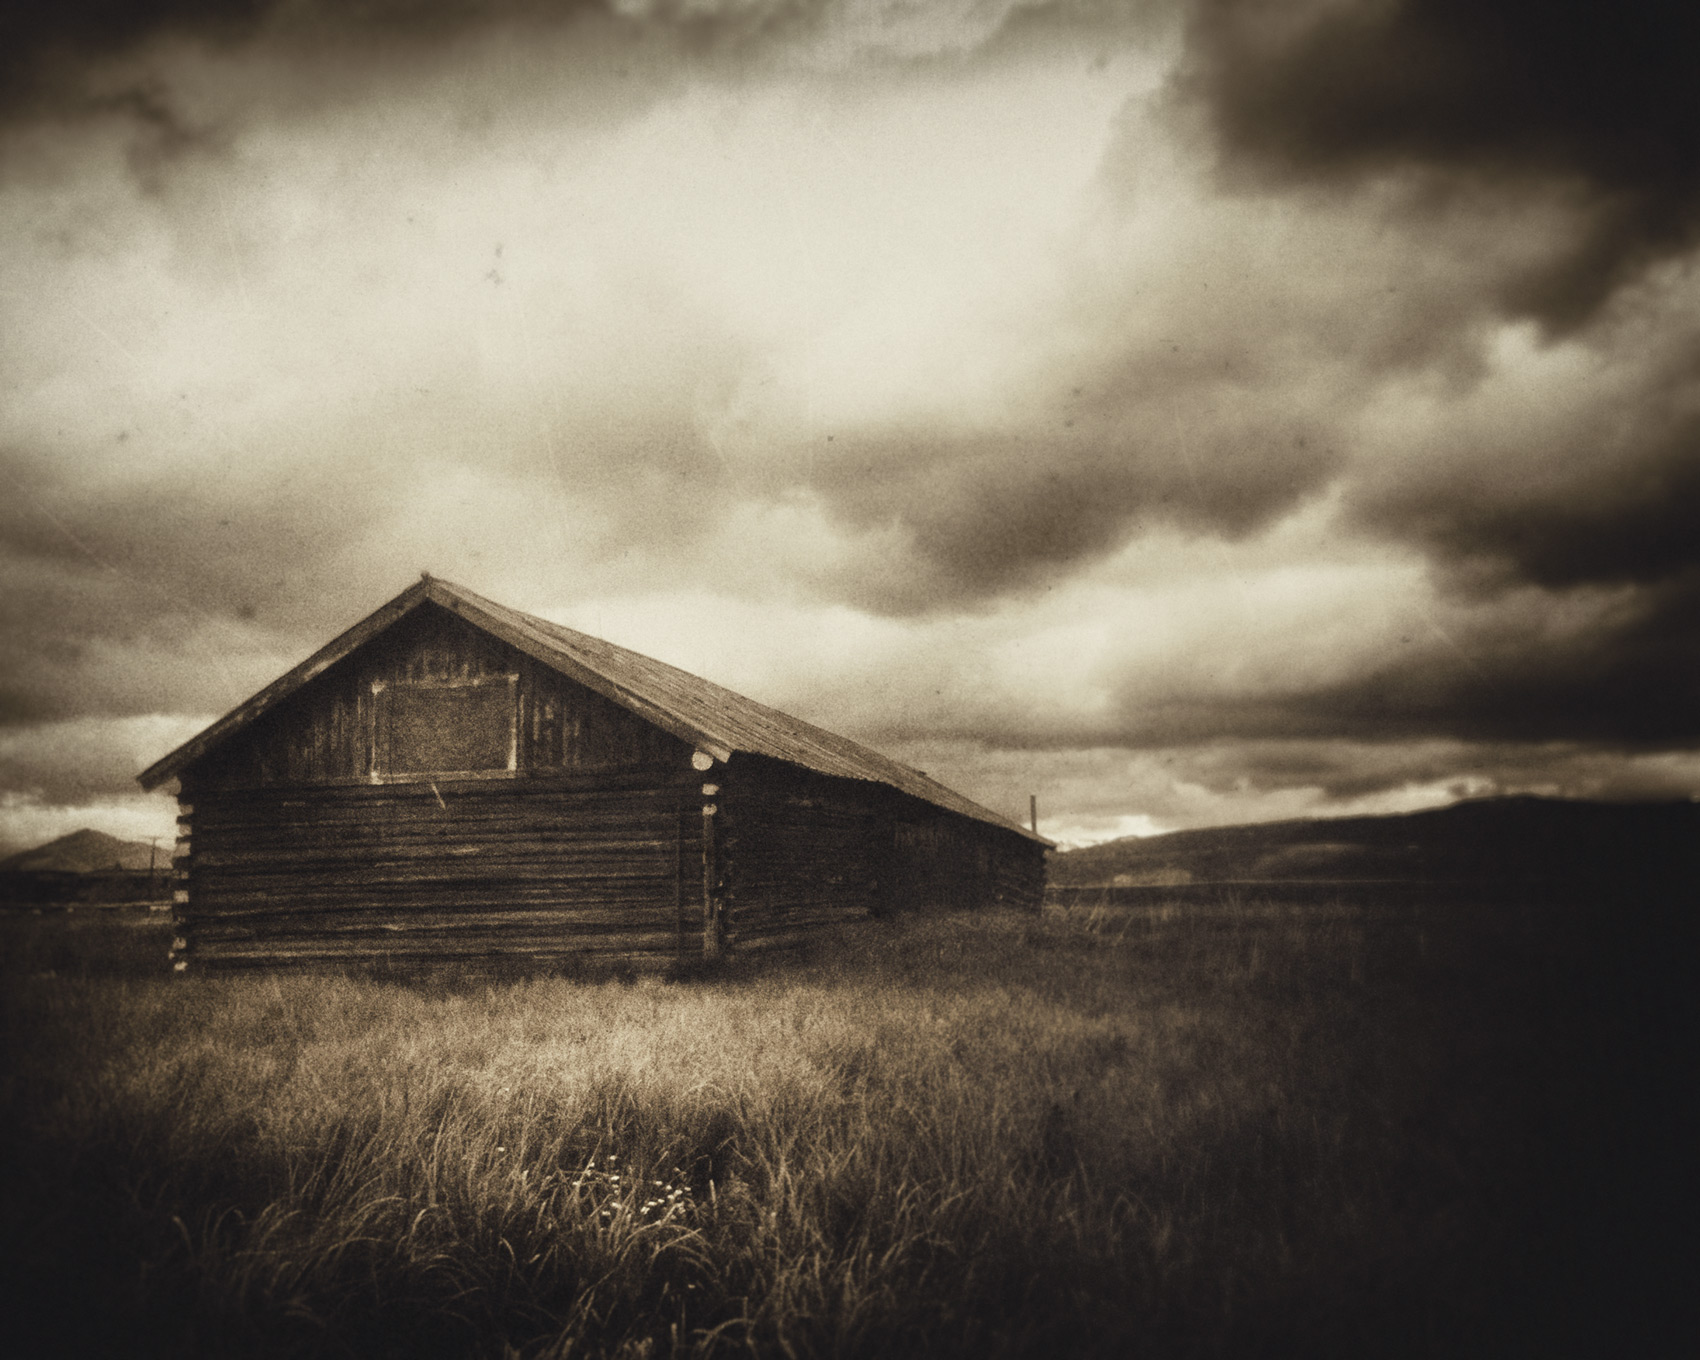 Barn No. 1 (East)